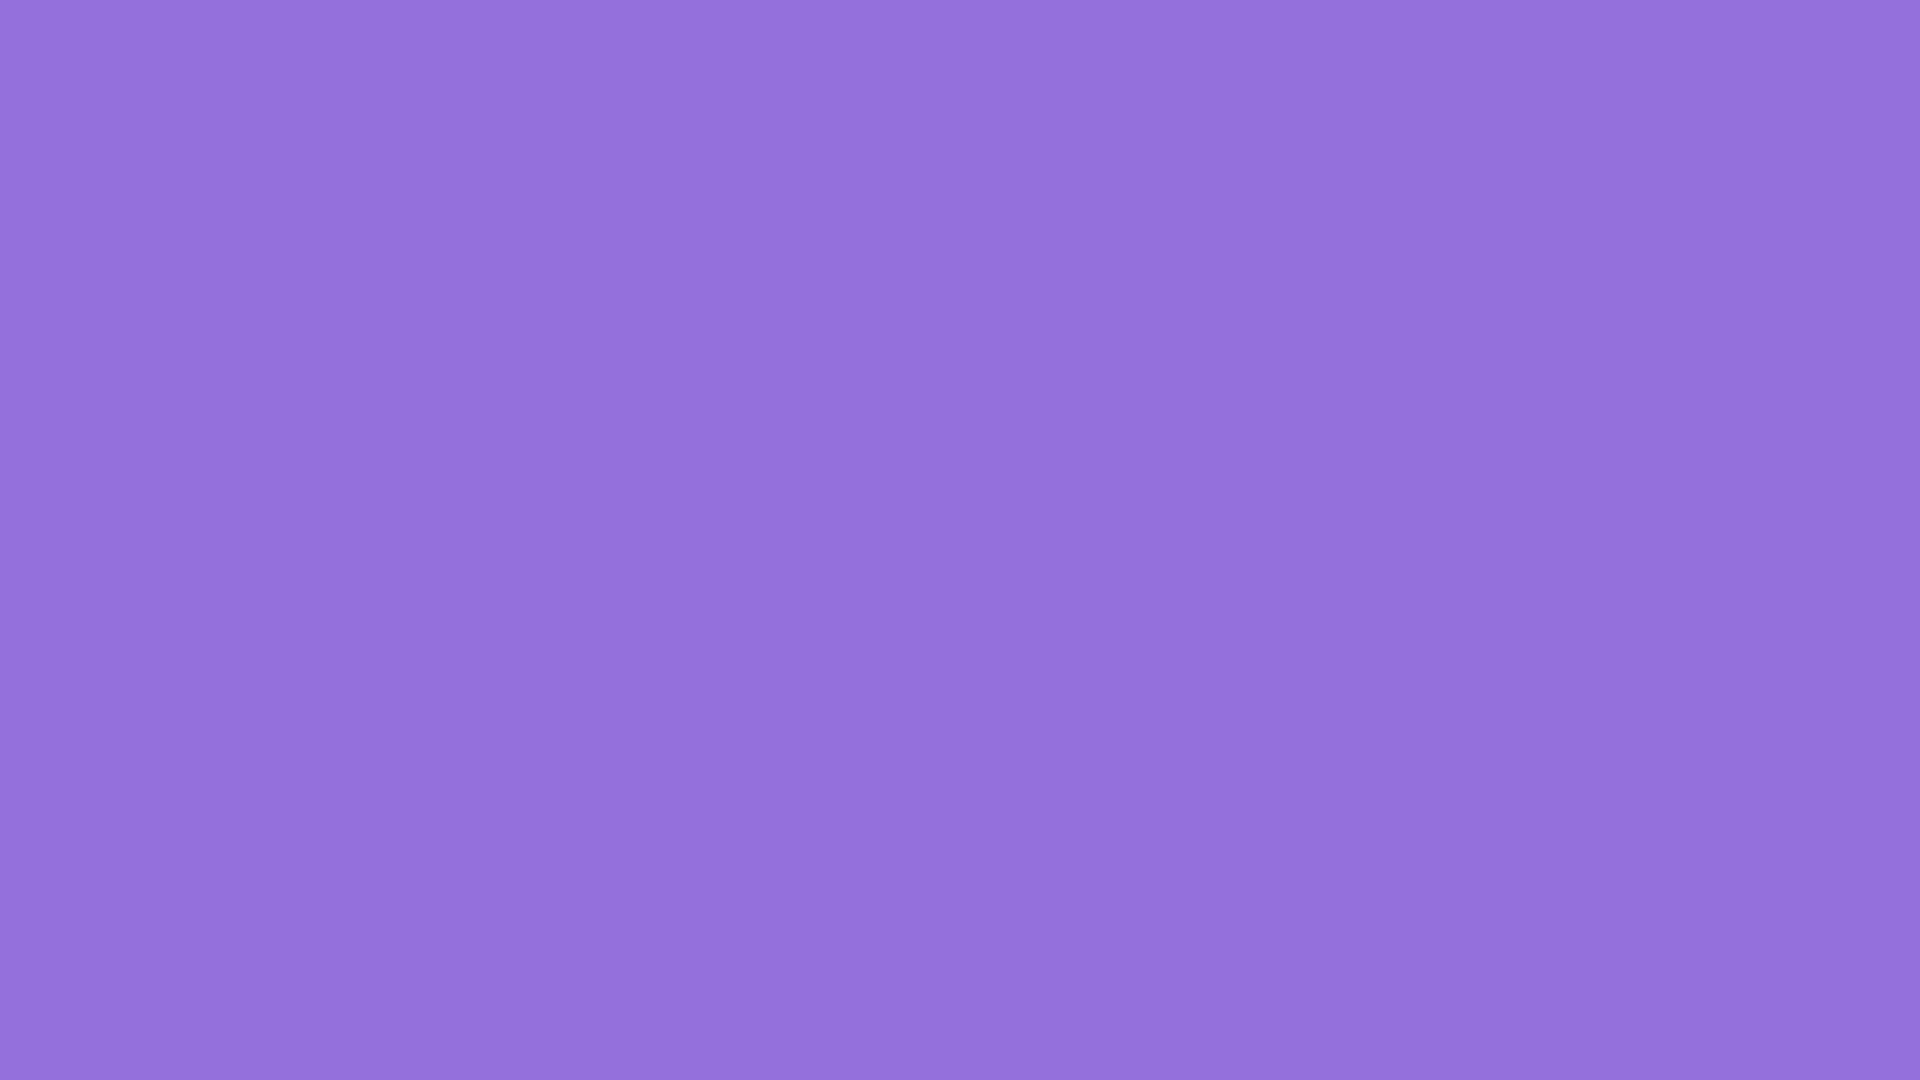 1920x1080 Medium Purple Solid Color Background